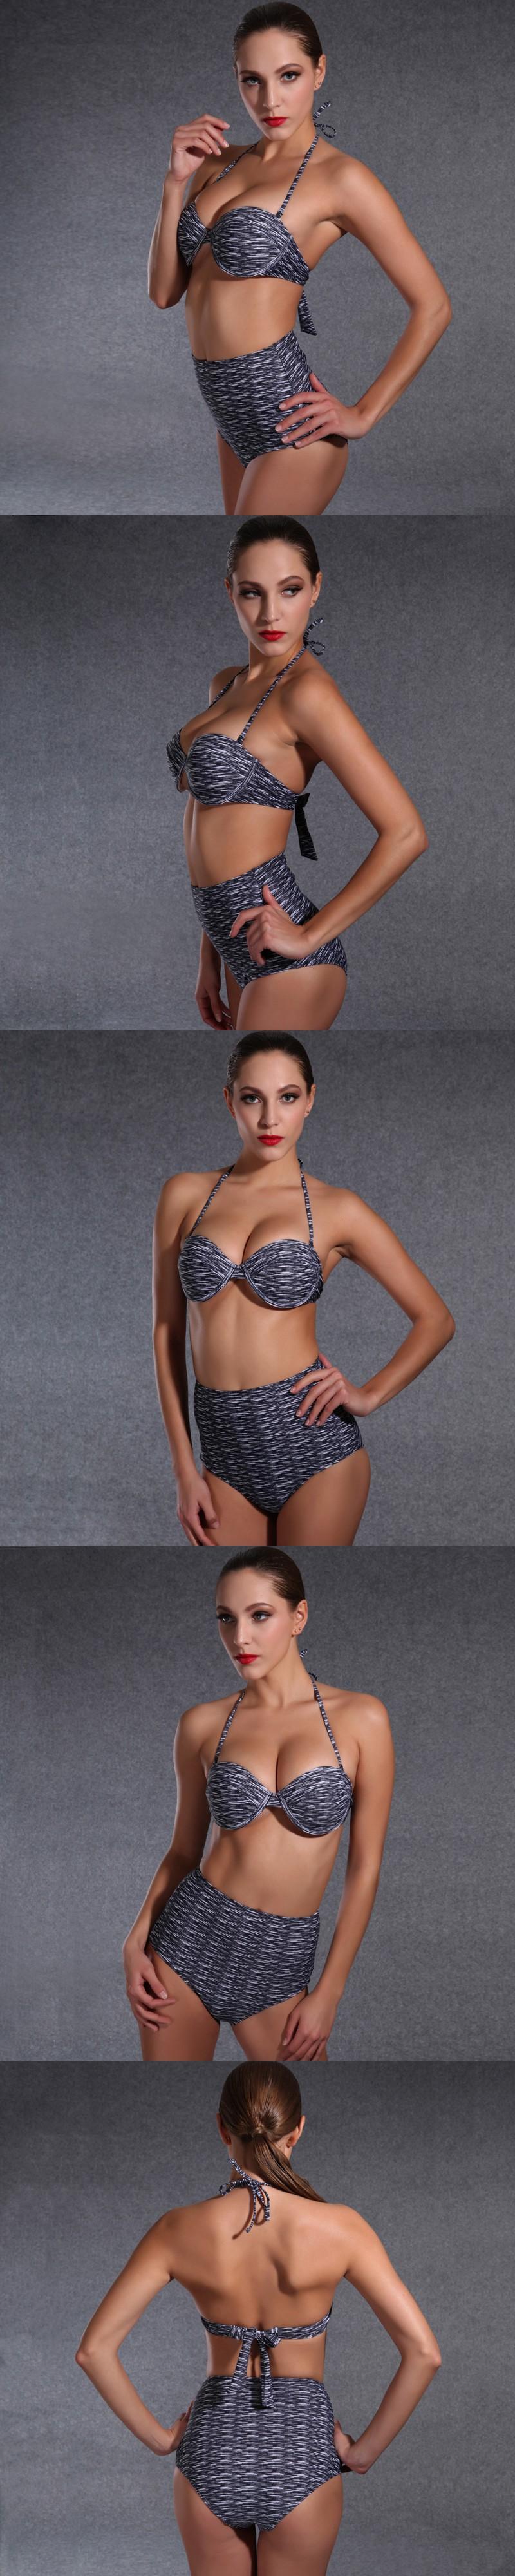 High Waist Brazilian Bikini SwimsuitWomen Push Up Swimwear Vintage Retro Floral Bathing Suit Beach Wear $15.27